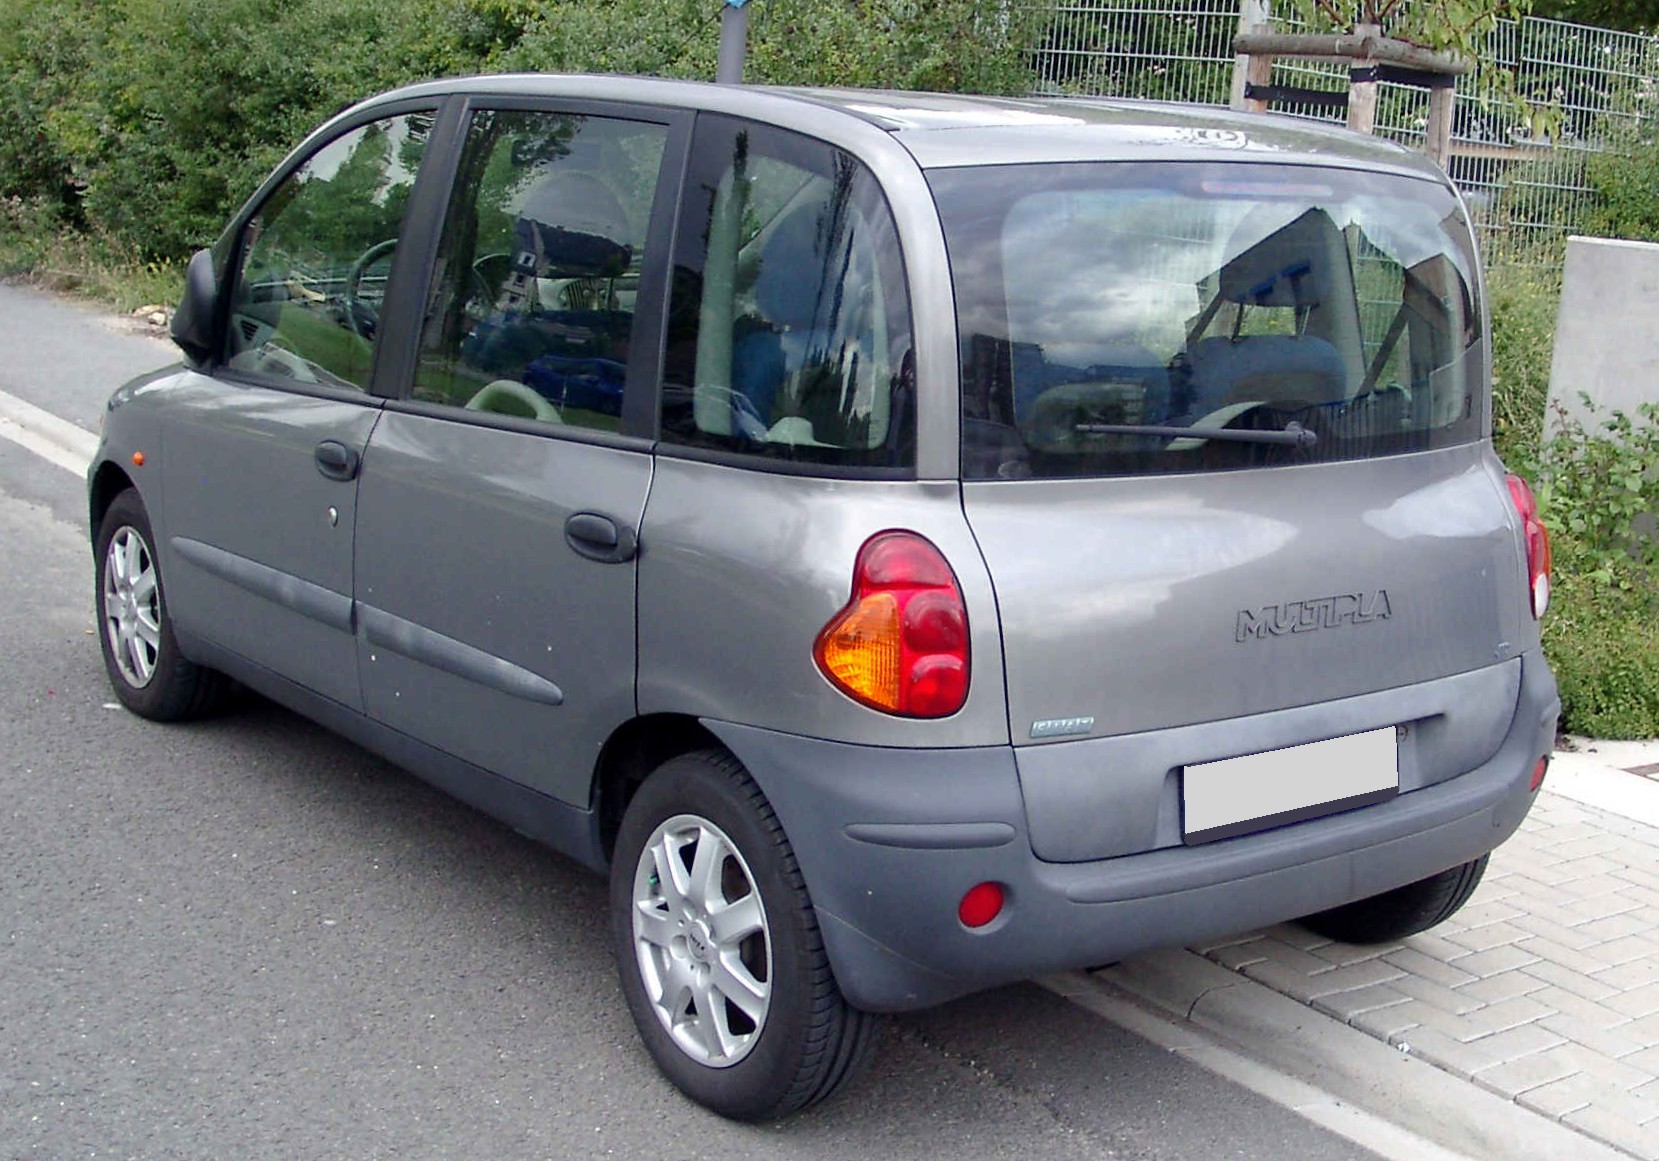 Fiat Multipla Reviews Fiat Multipla Car Reviews